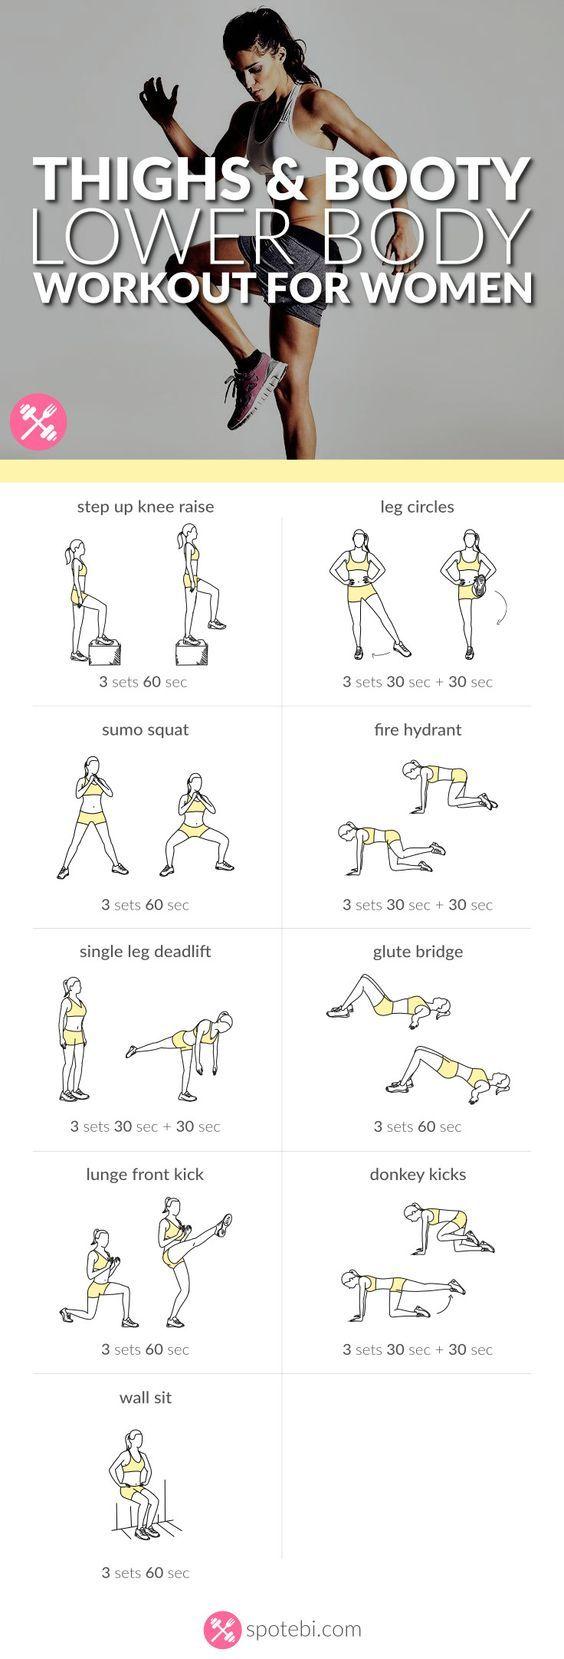 Free weight loss programs nyc